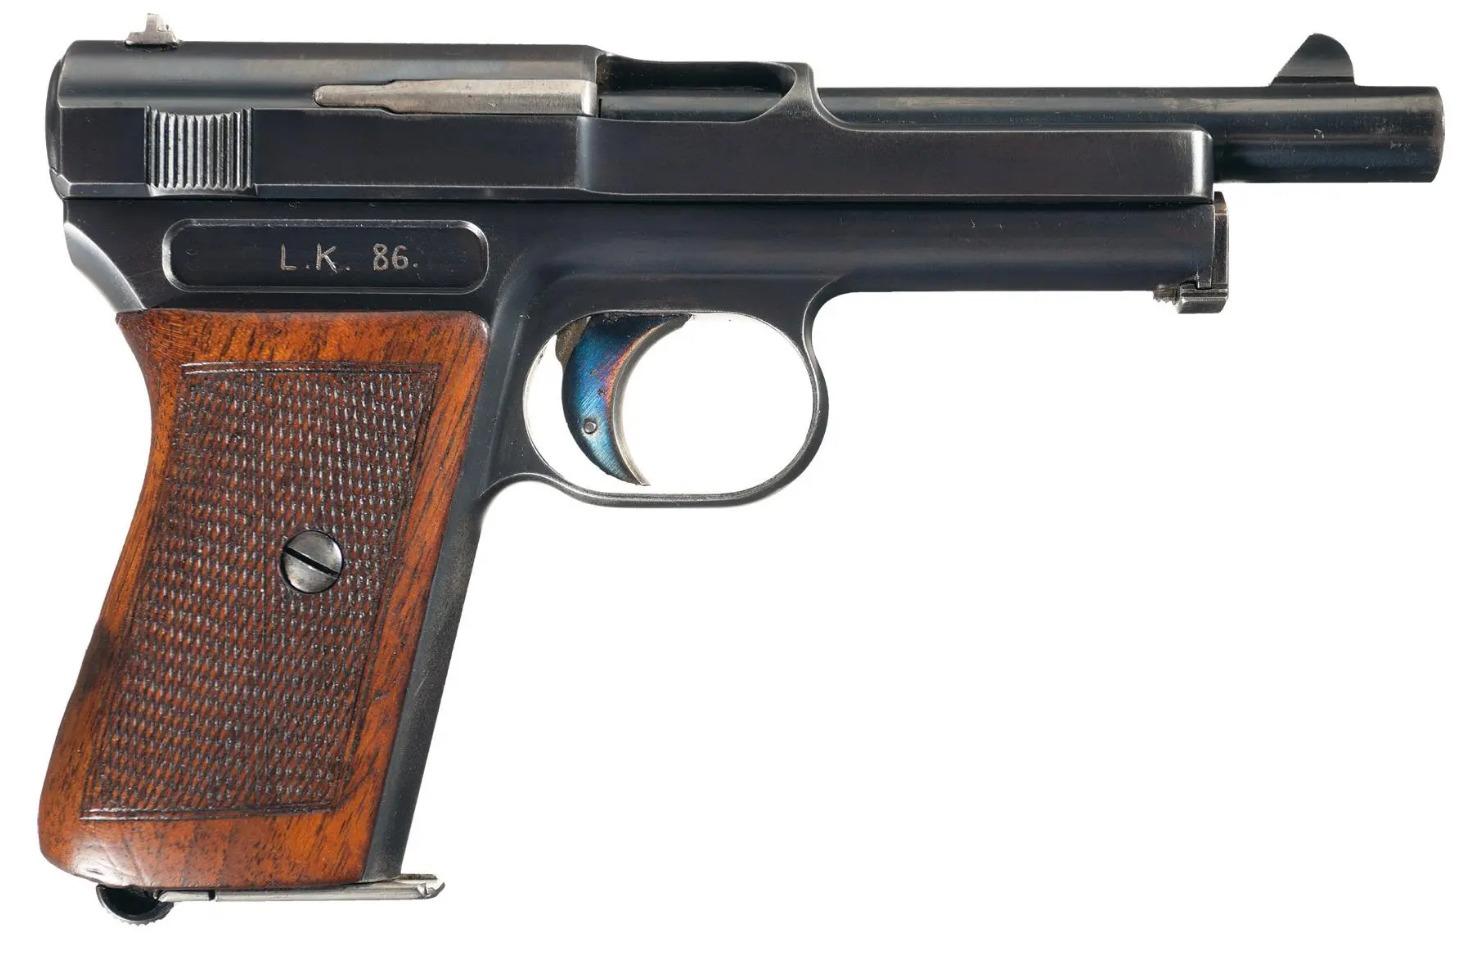 Mauser M1914 humpback long barrel automatic pistol